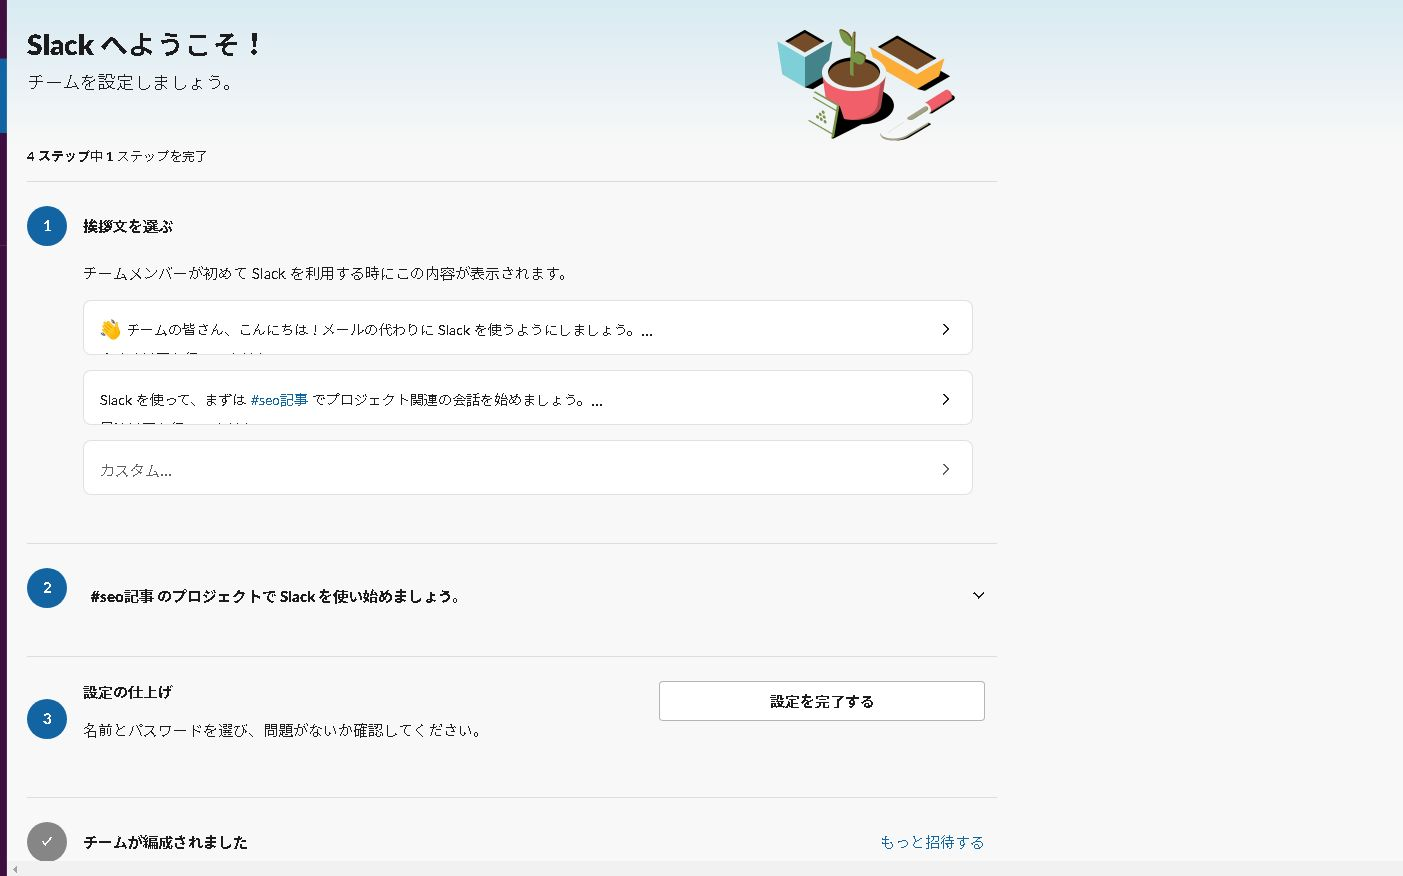 Slackの登録完了画面